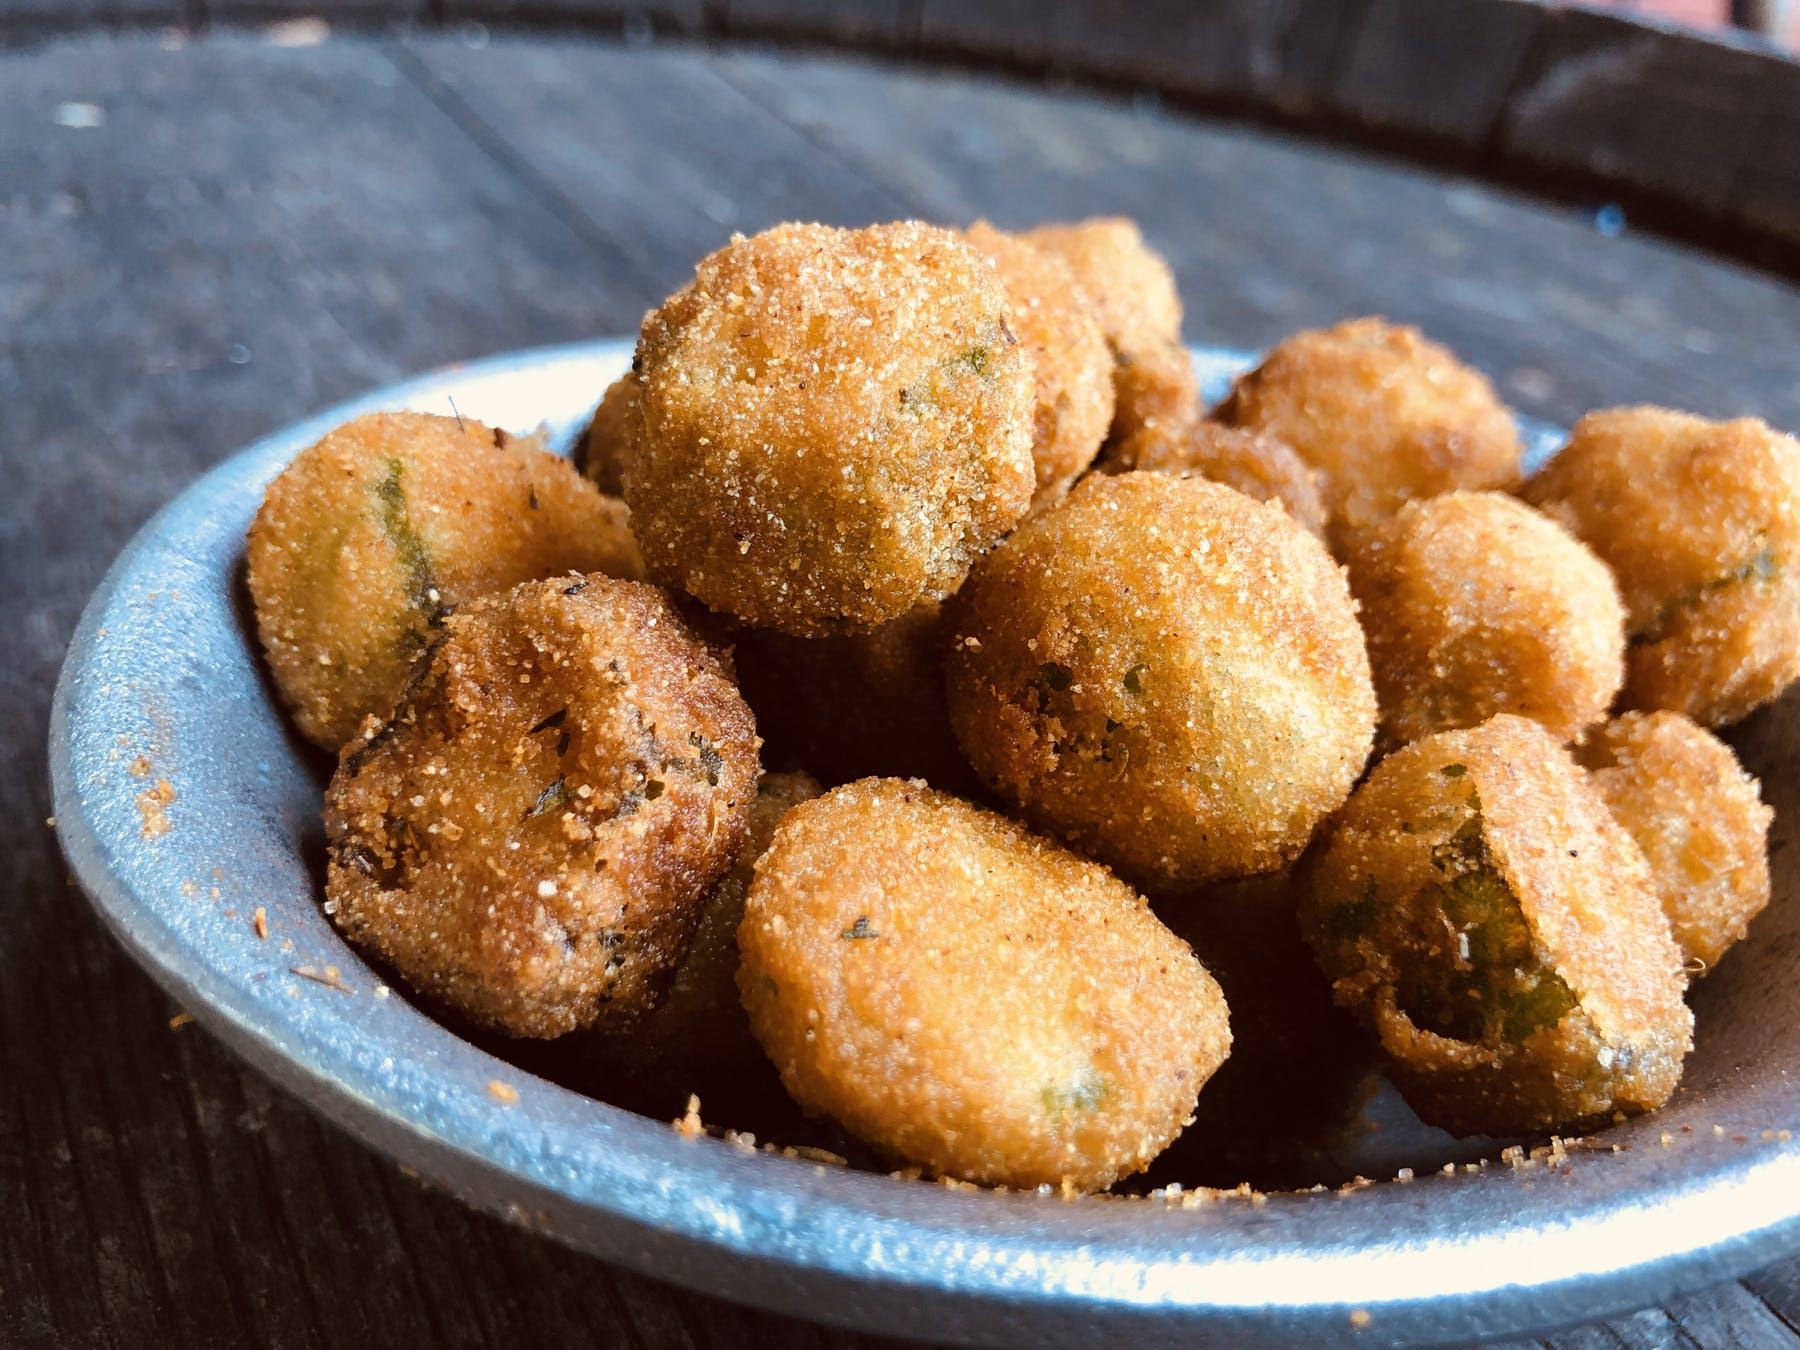 a close up of fried okra